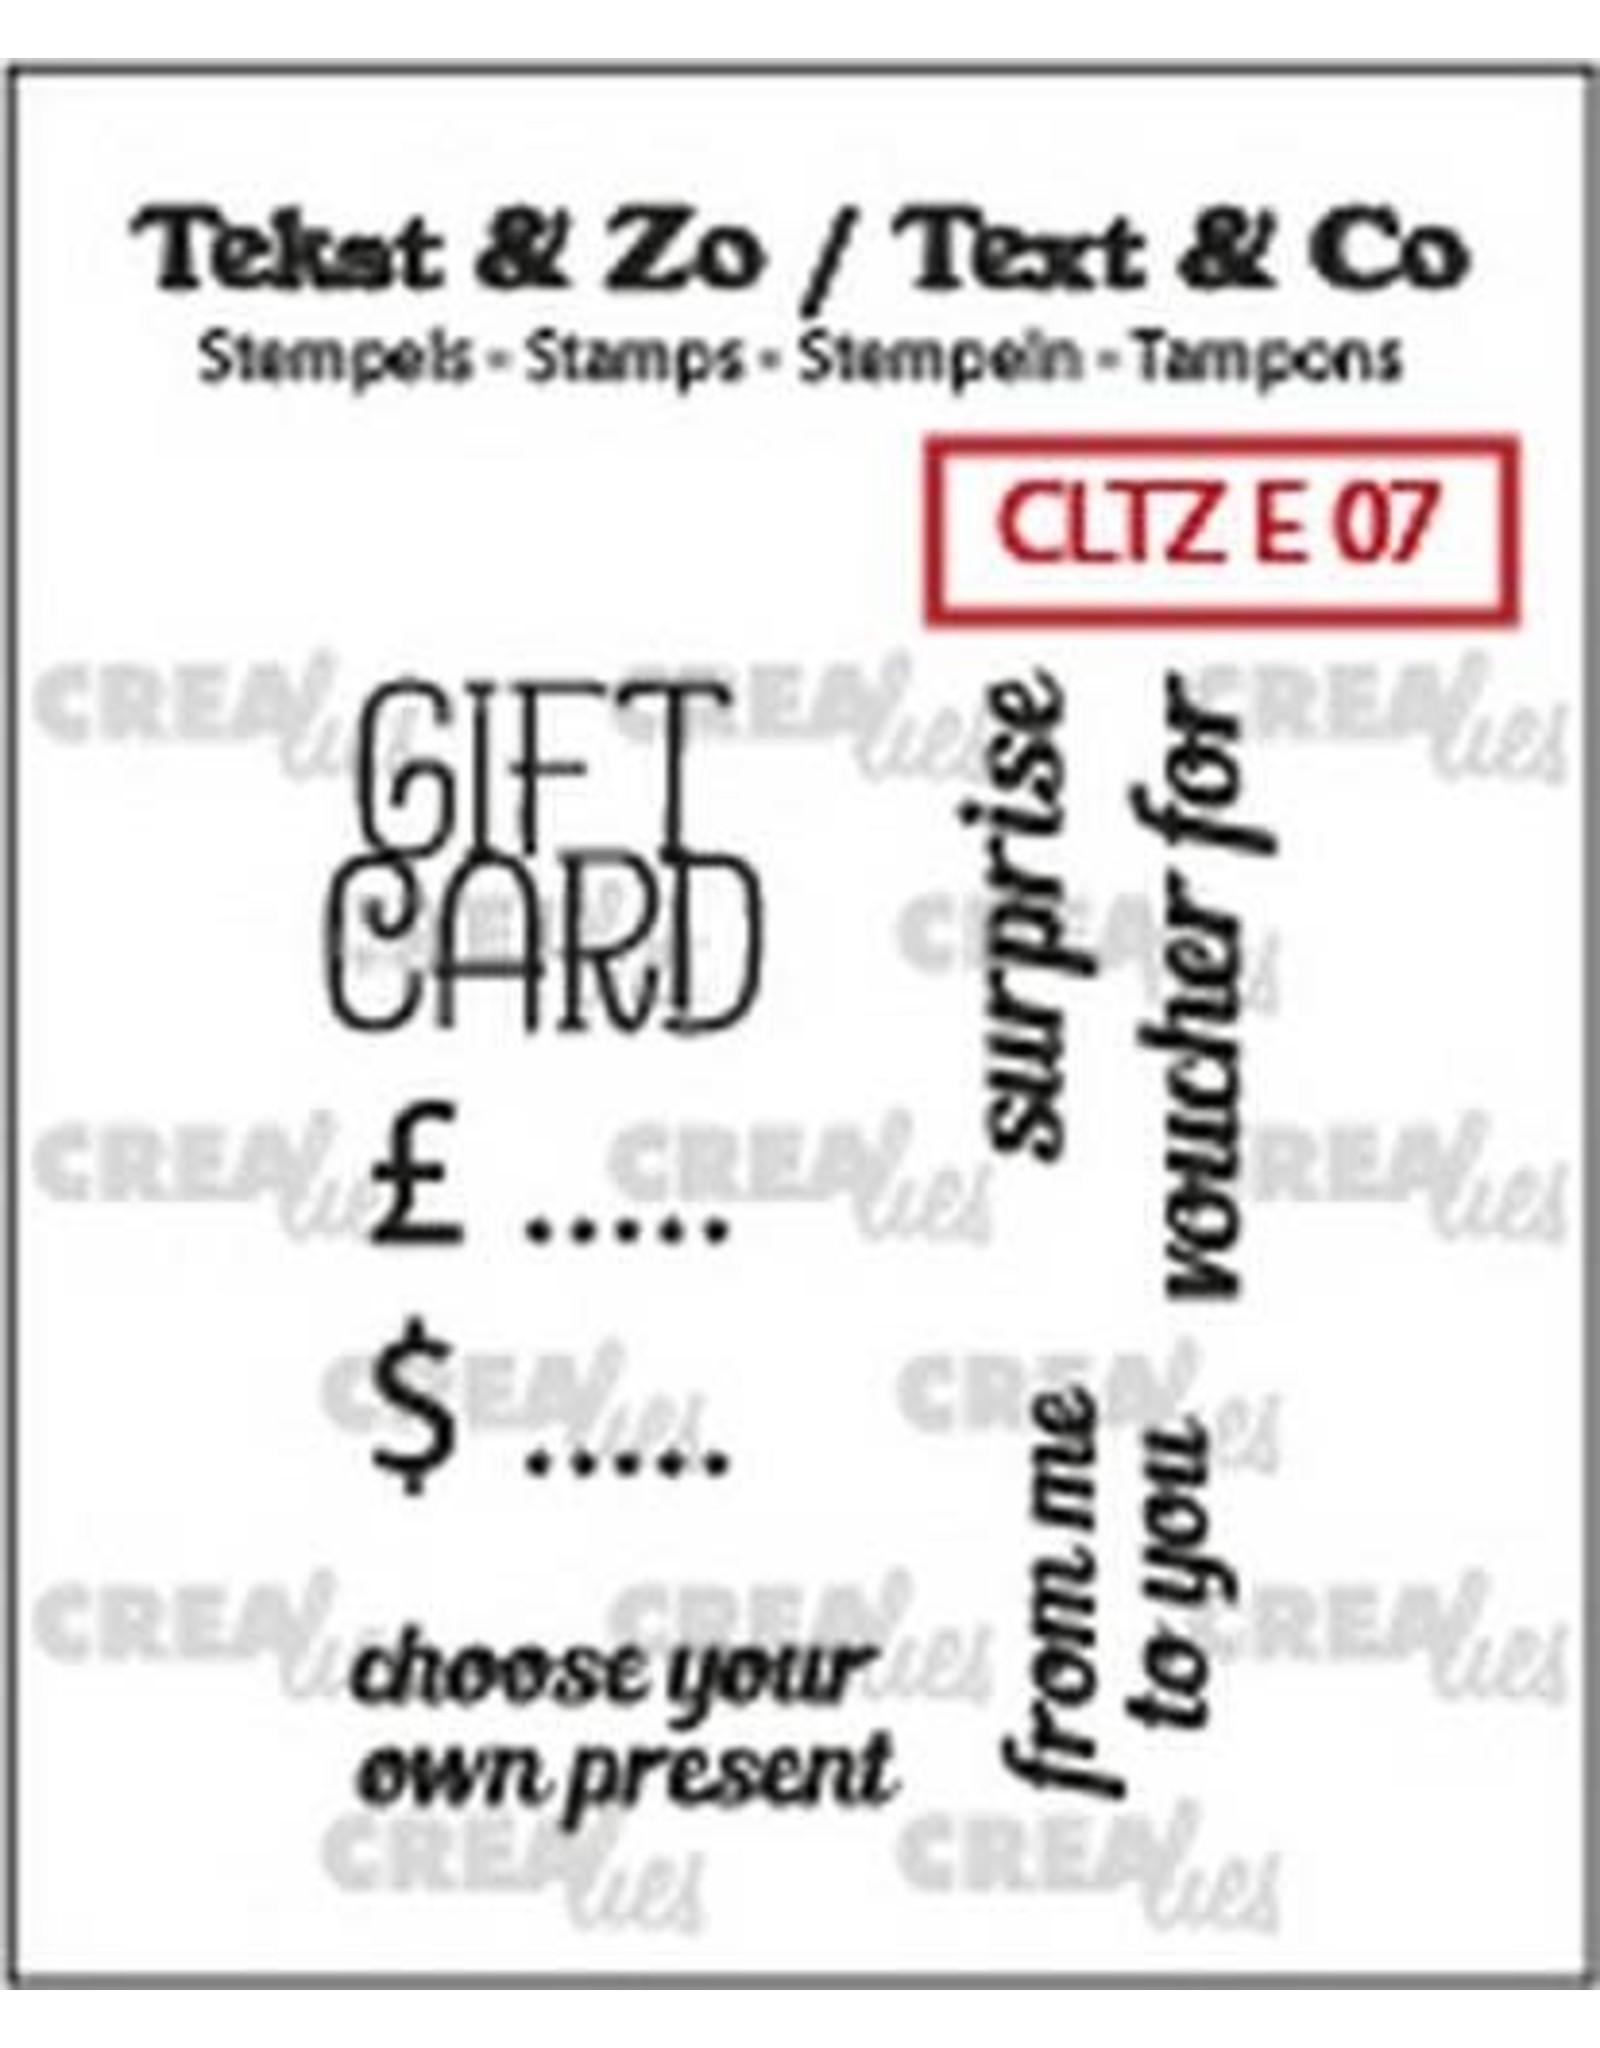 Crealies Crealies Clearstamp Tekst & Zo text gift card (ENG) CLTZE07